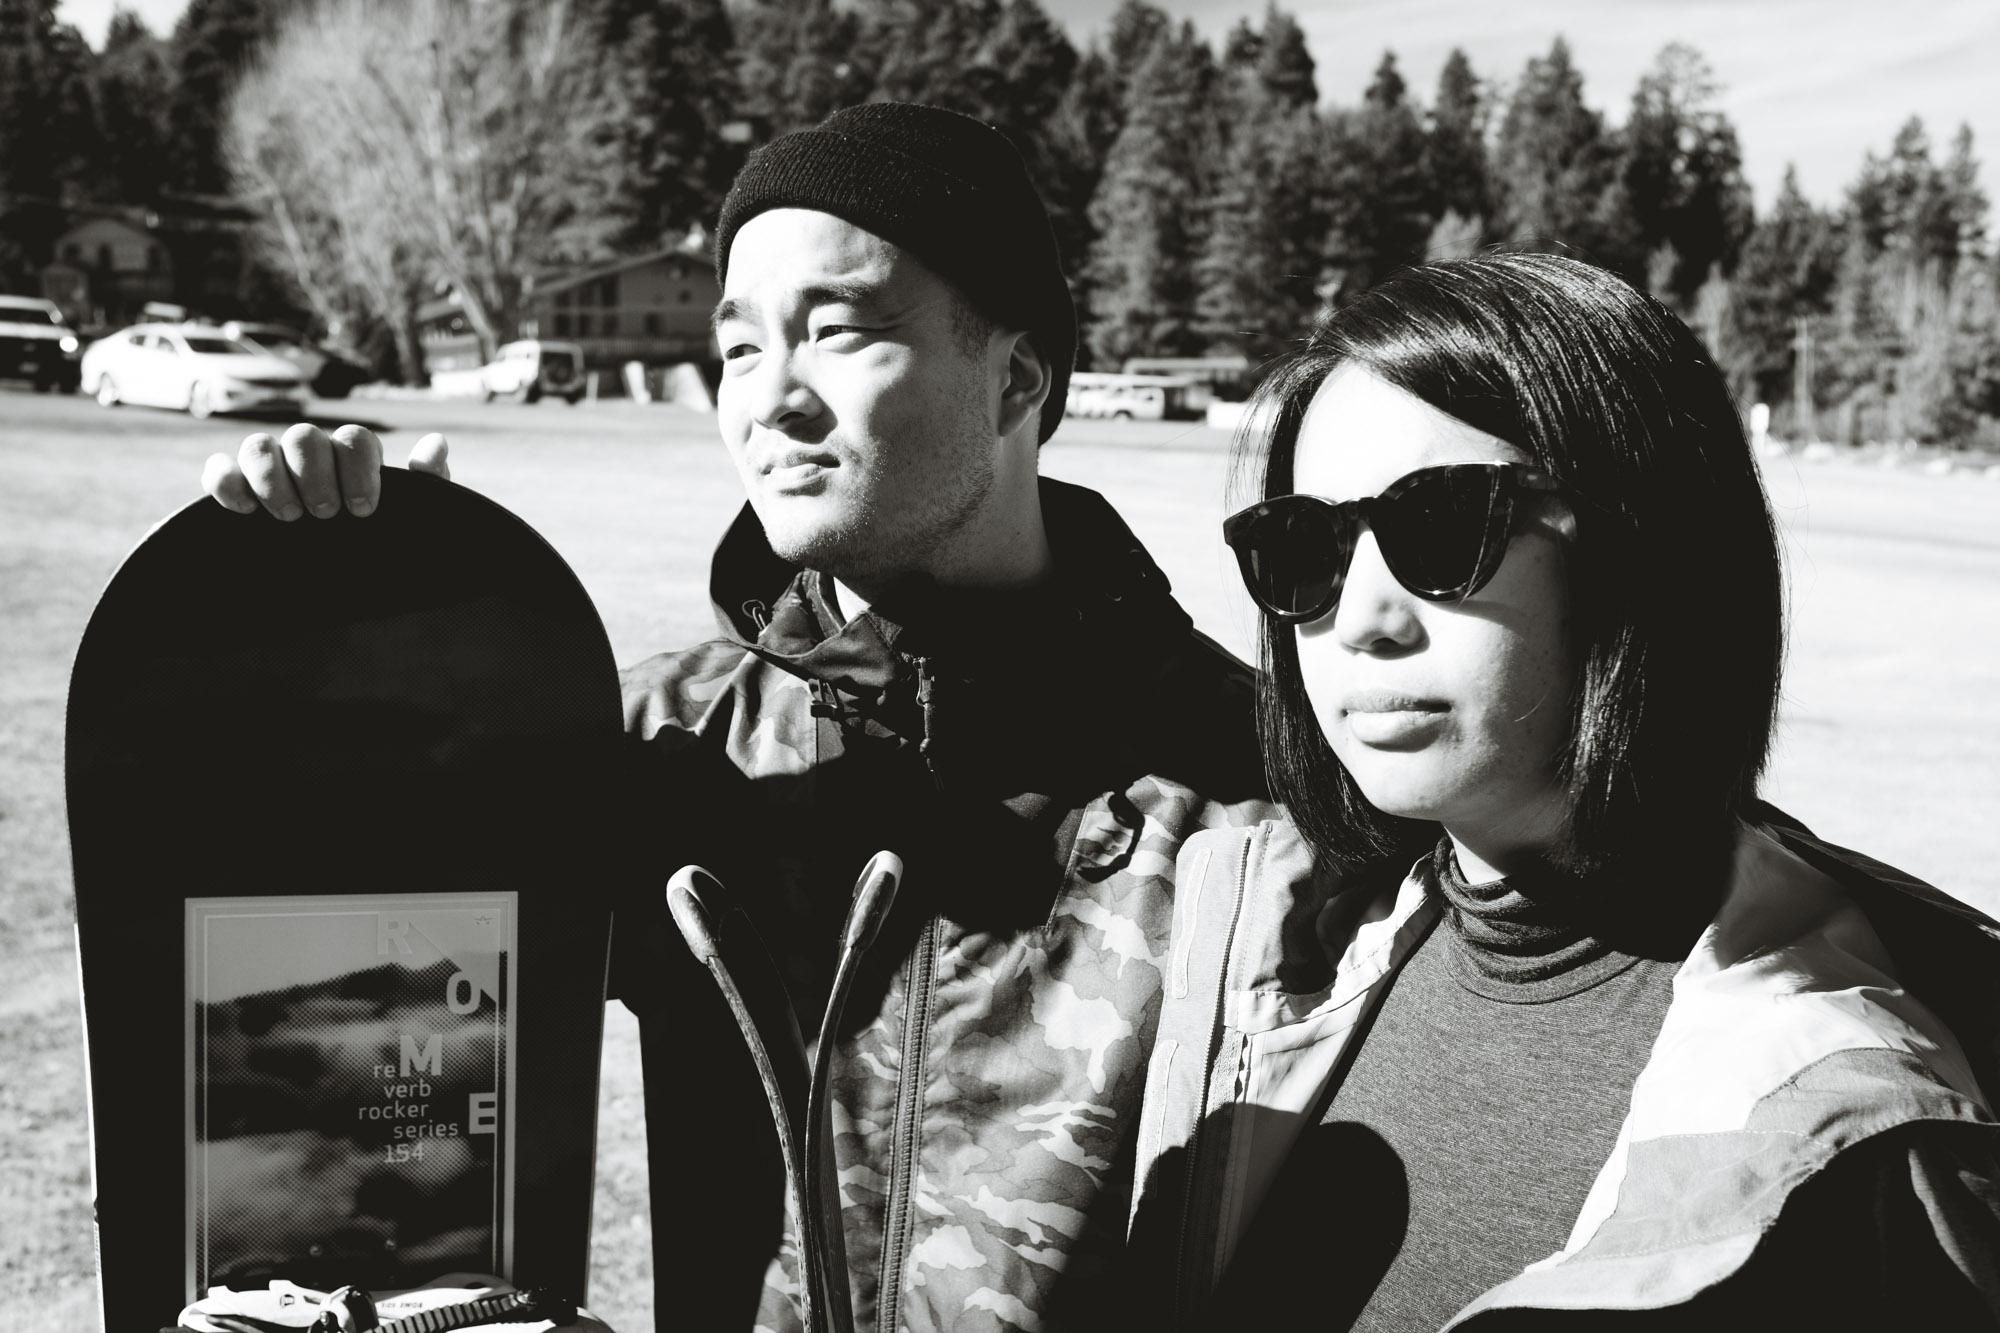 Charles and Marianne in Big Bear